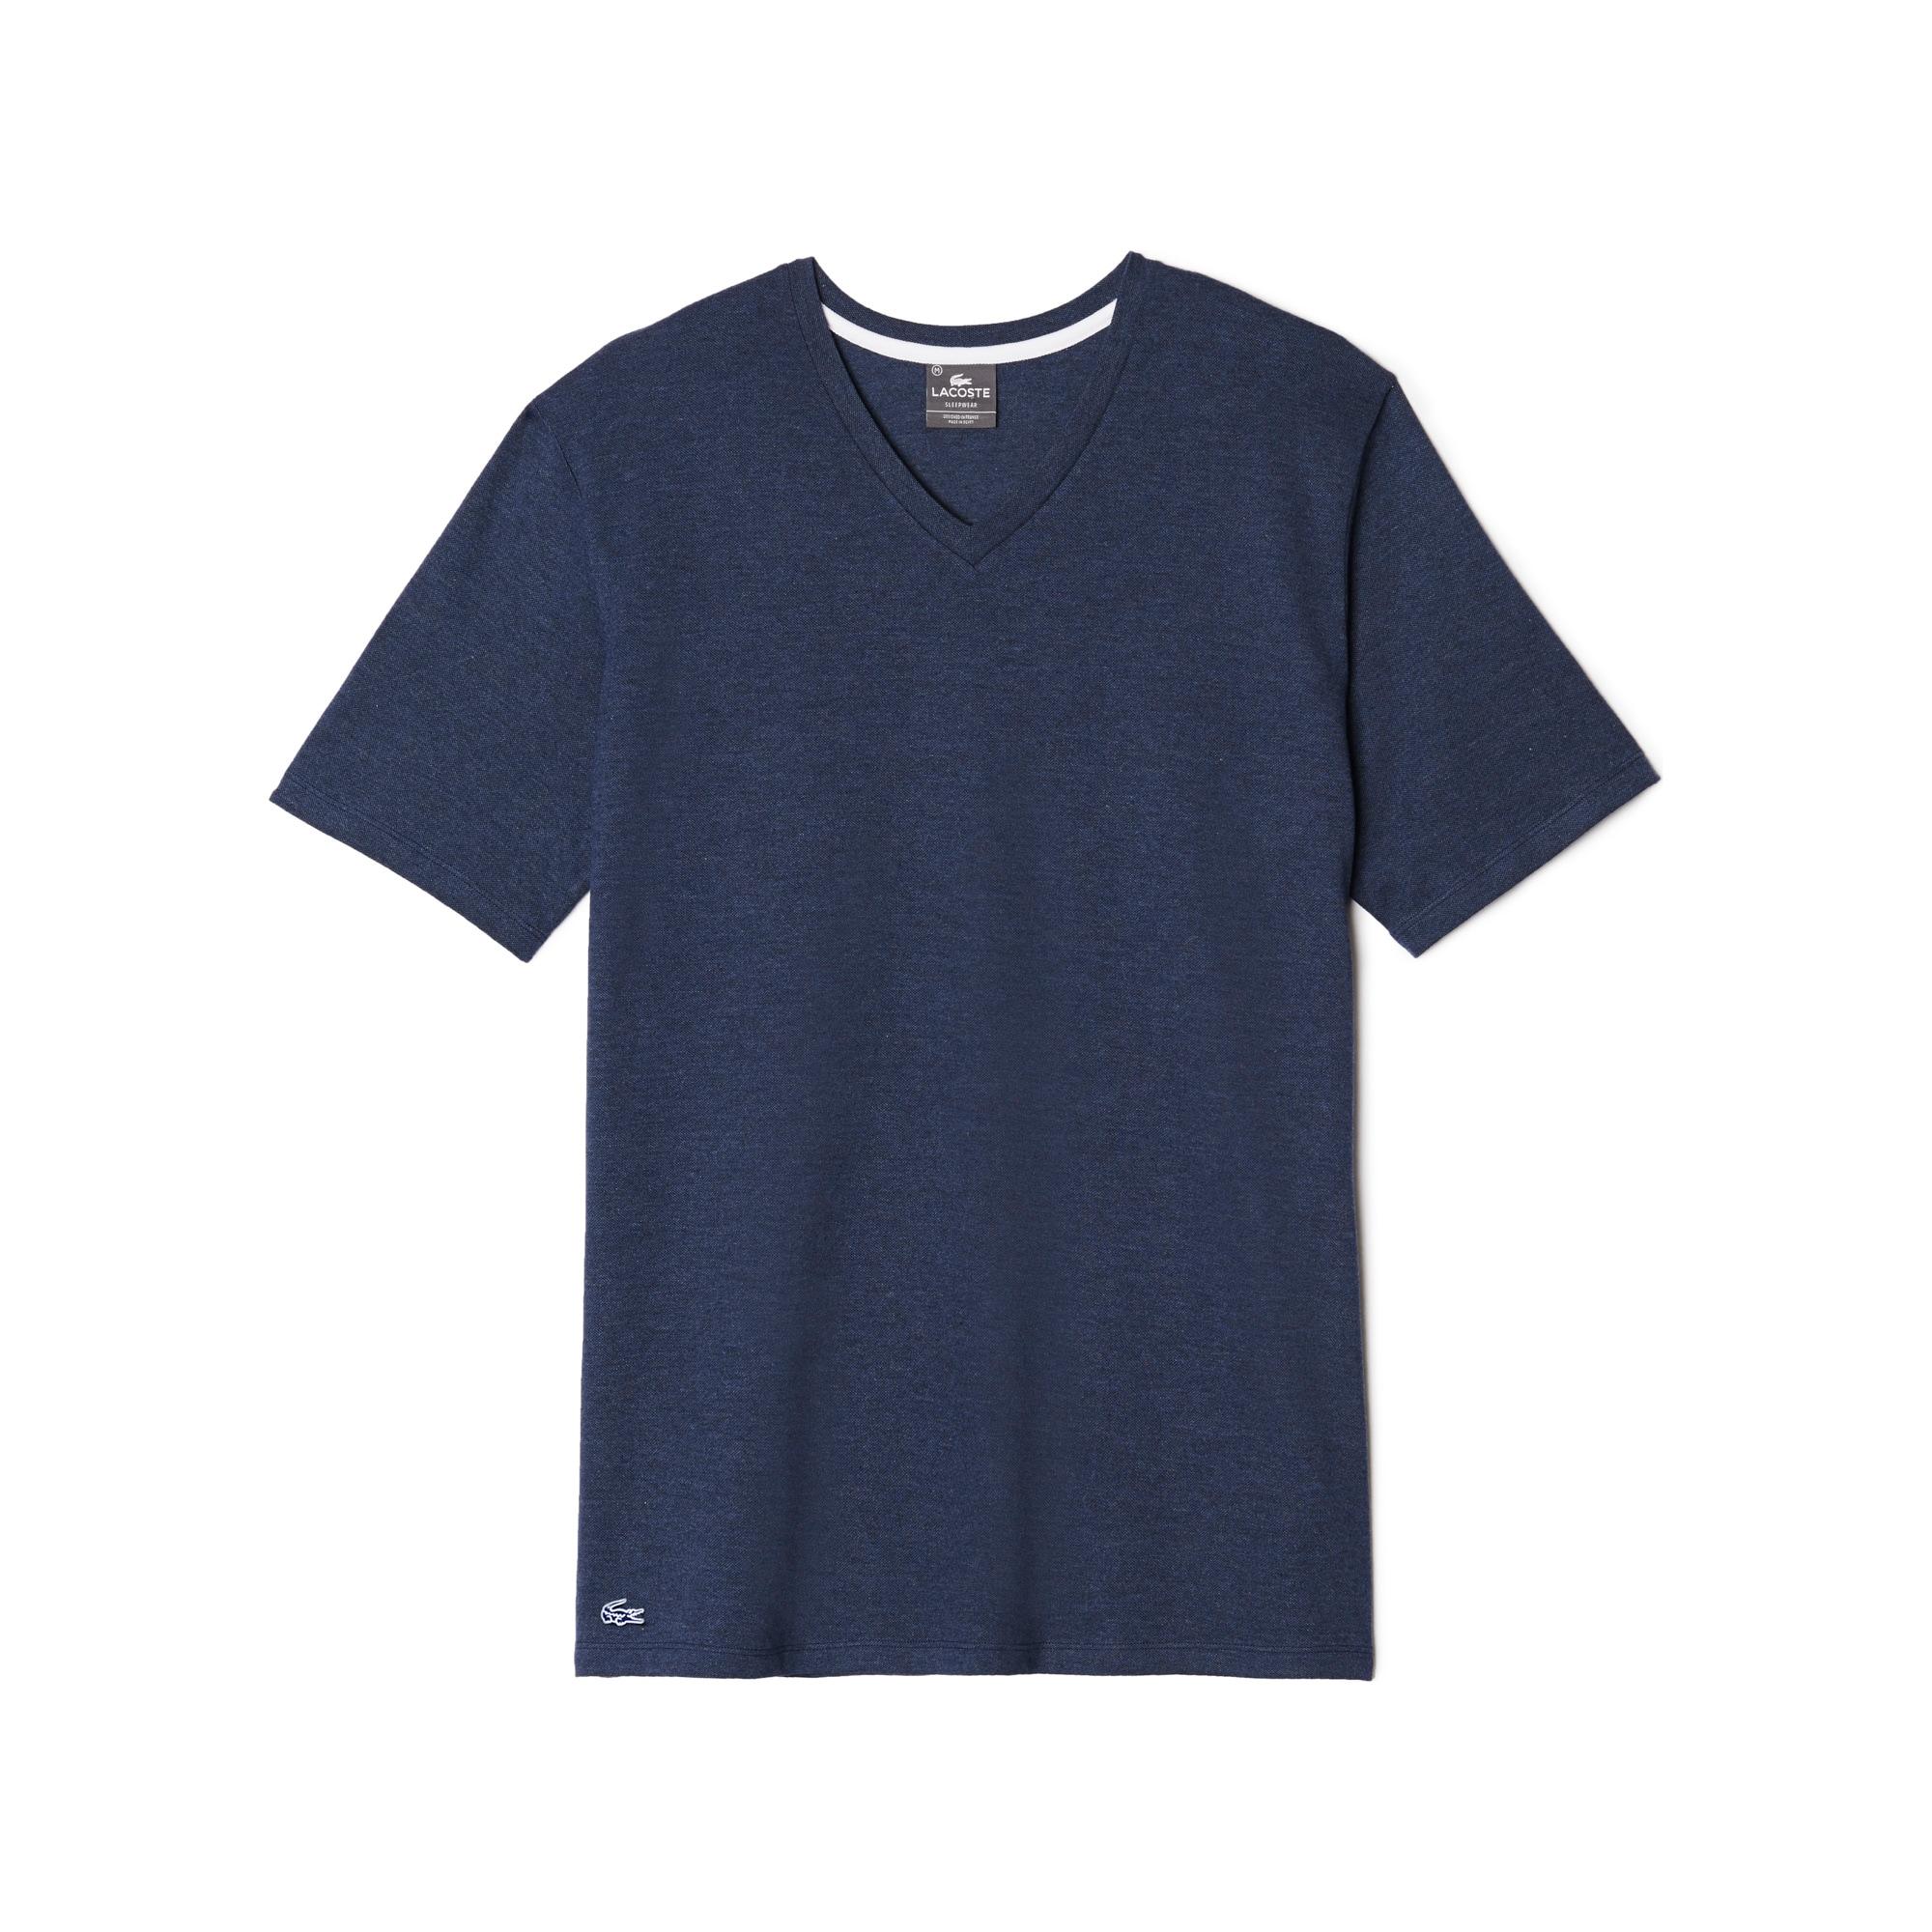 T-shirt L.12.12